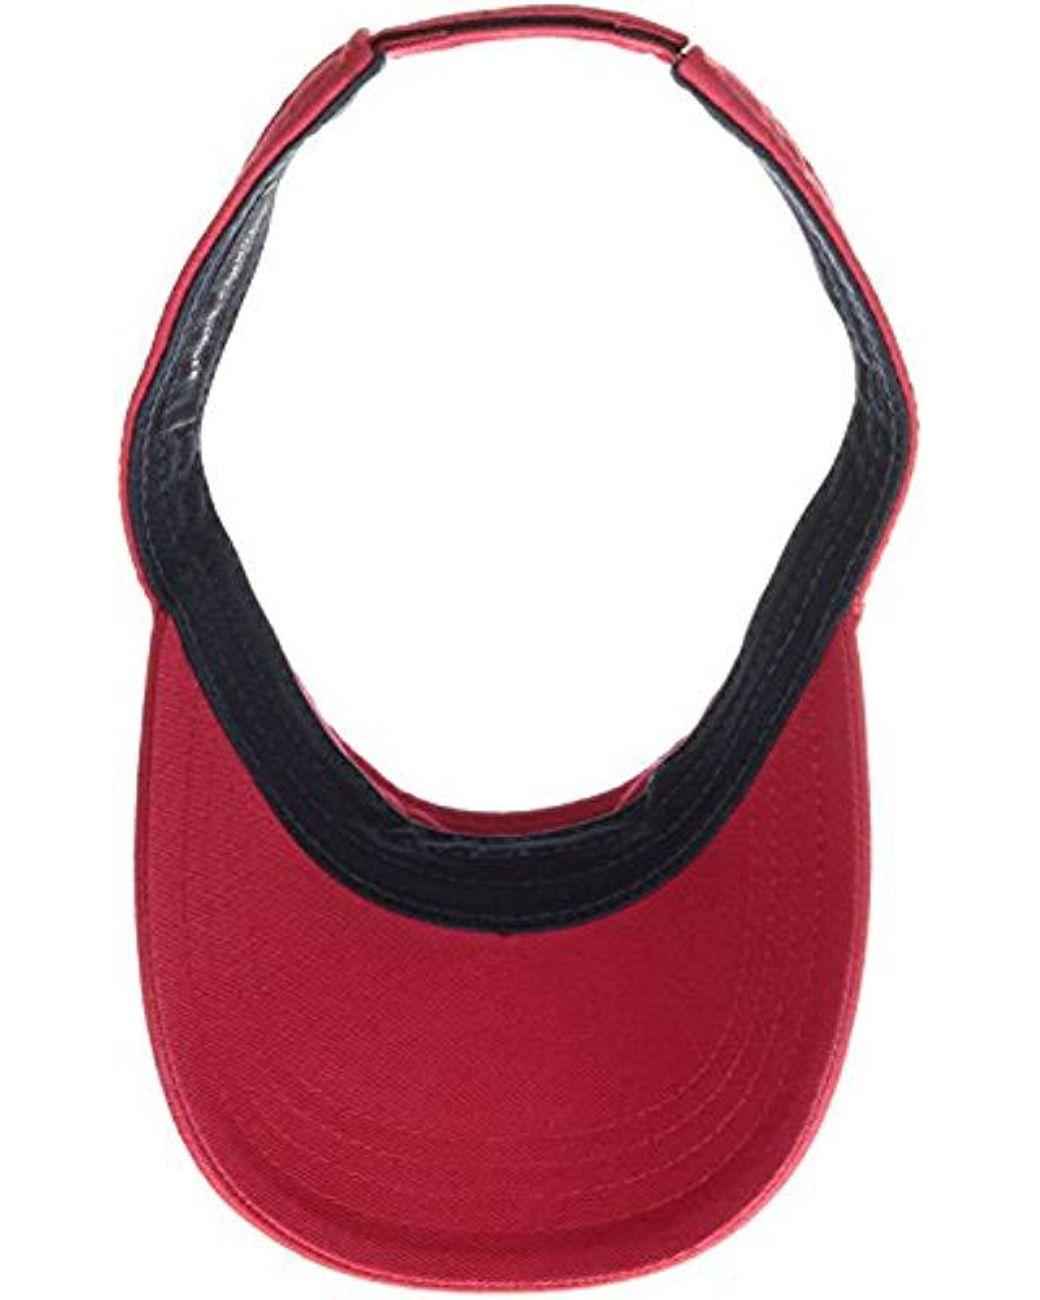 746baabc Tommy Hilfiger Dad Hat Flag Solid Cotton Visor Baseball Cap in Red for Men  - Lyst